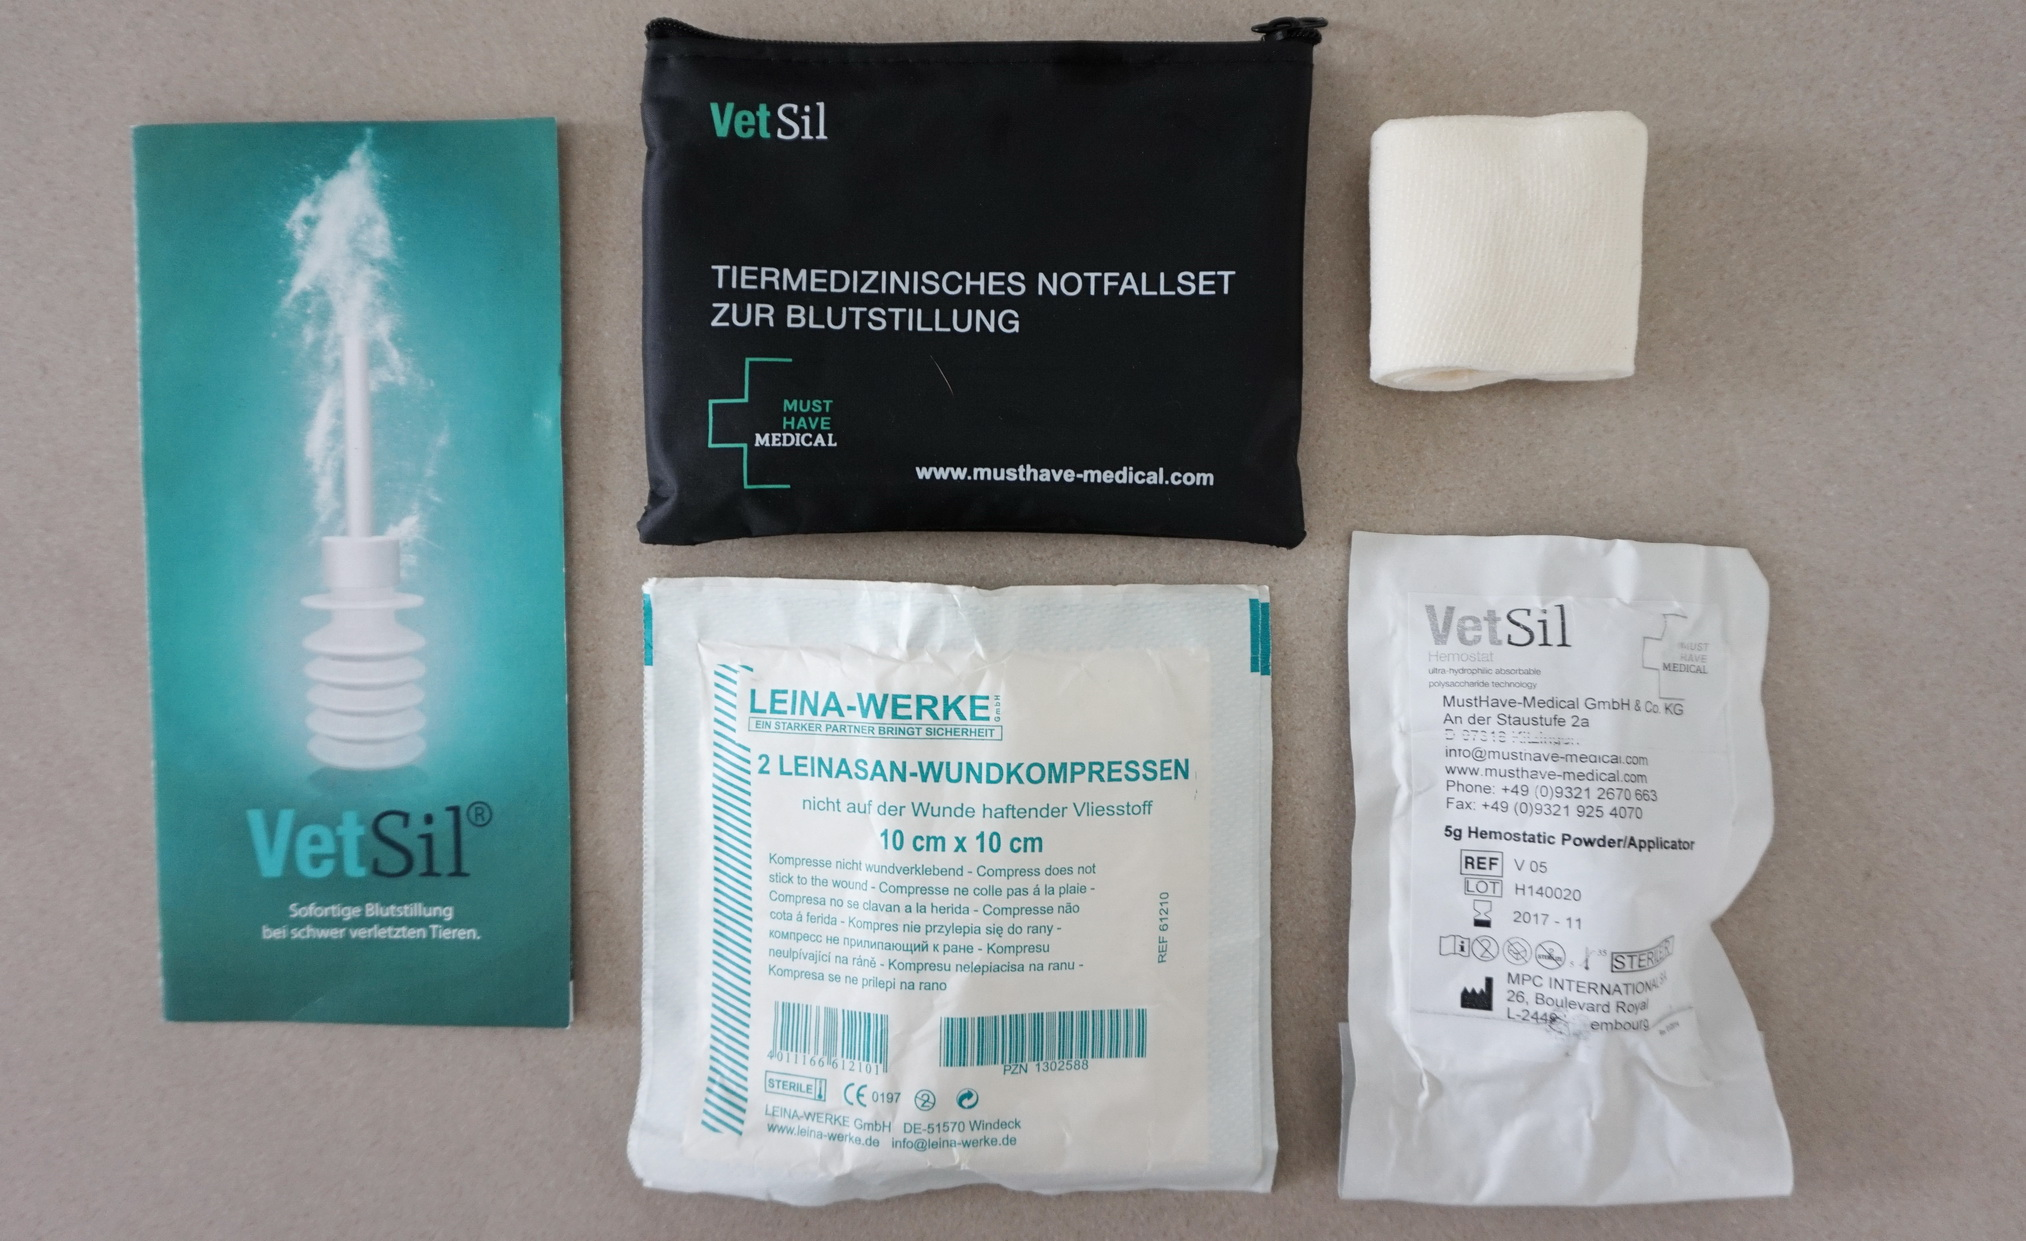 VetSil Notfallset 3